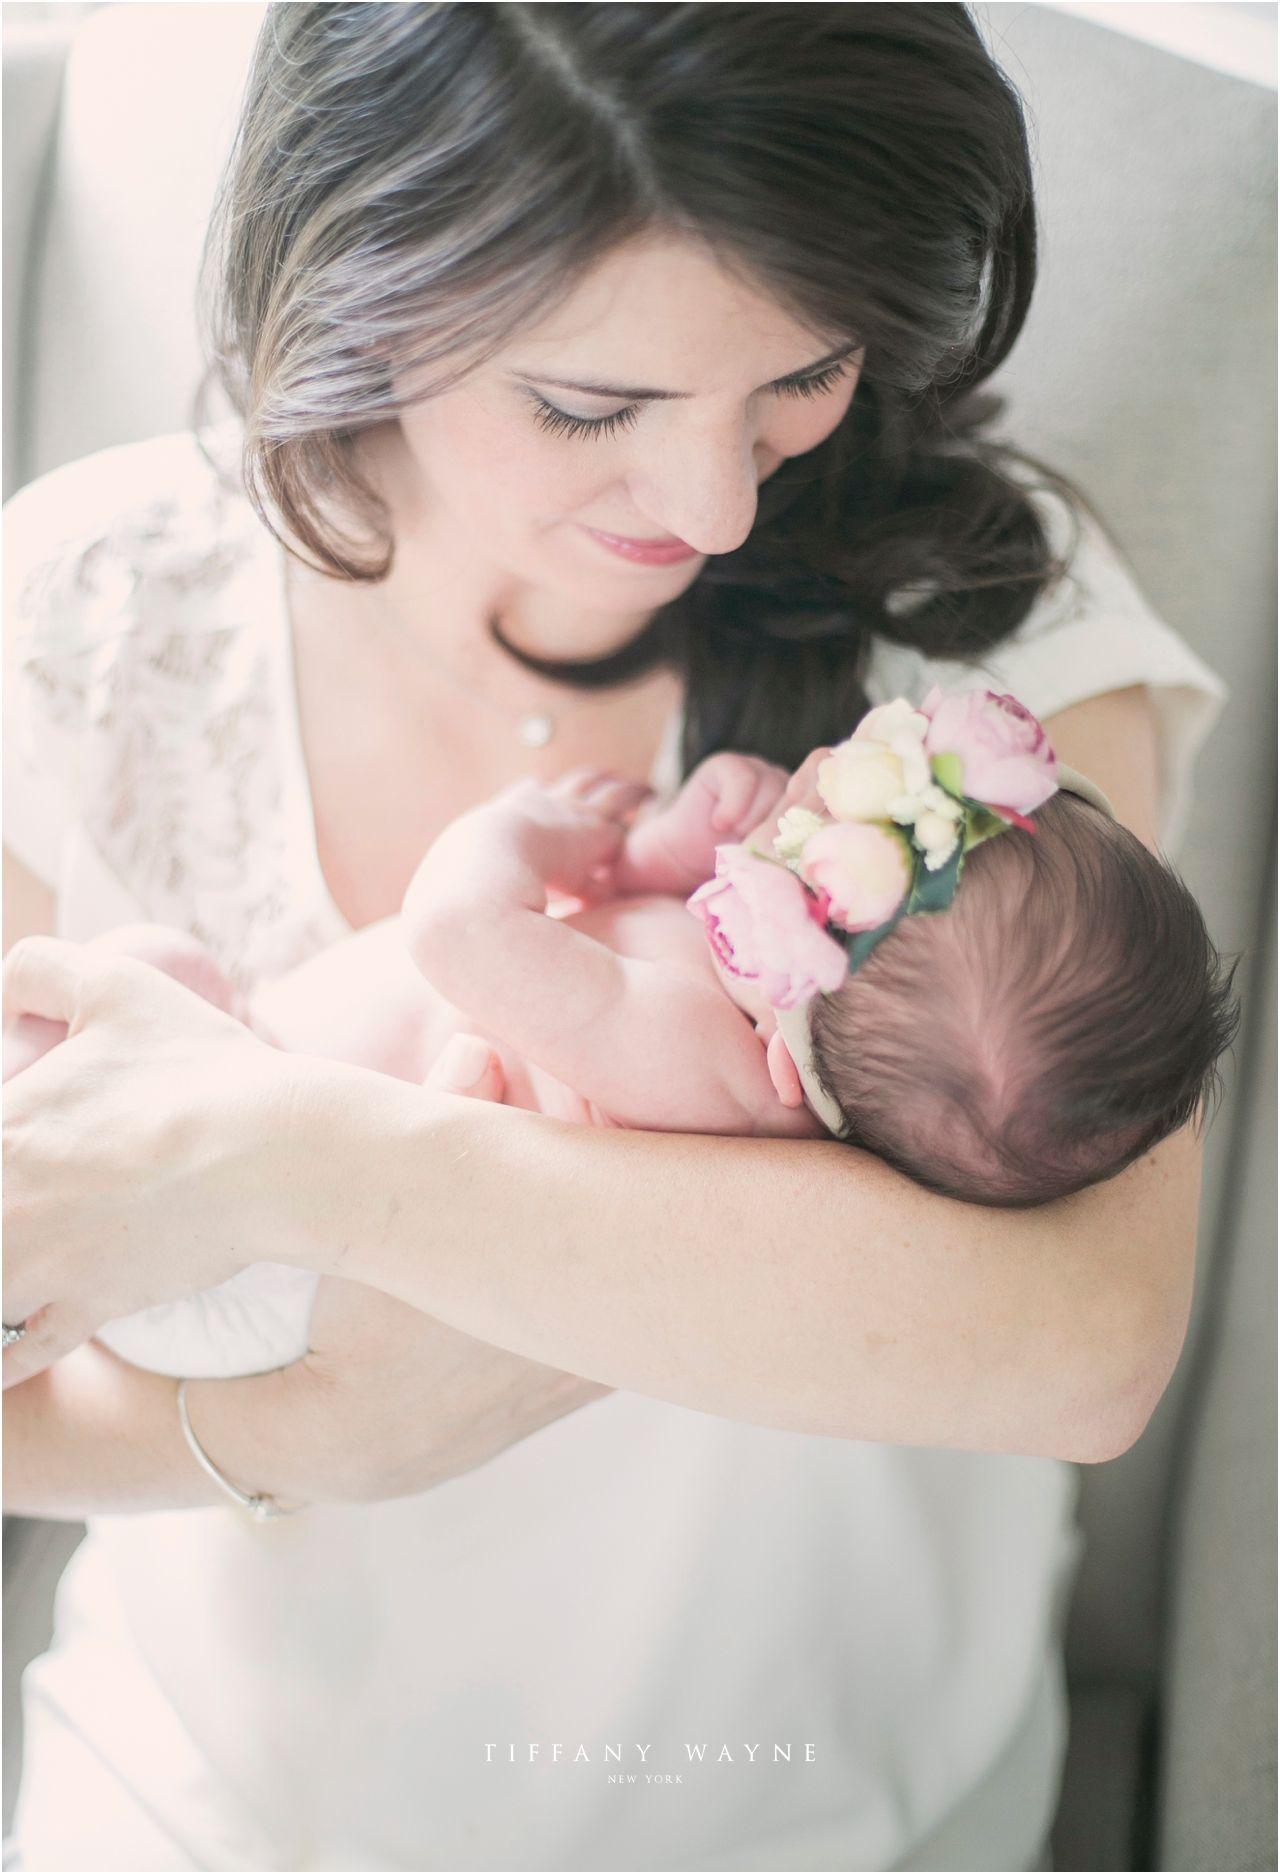 Holding A Newborn Baby